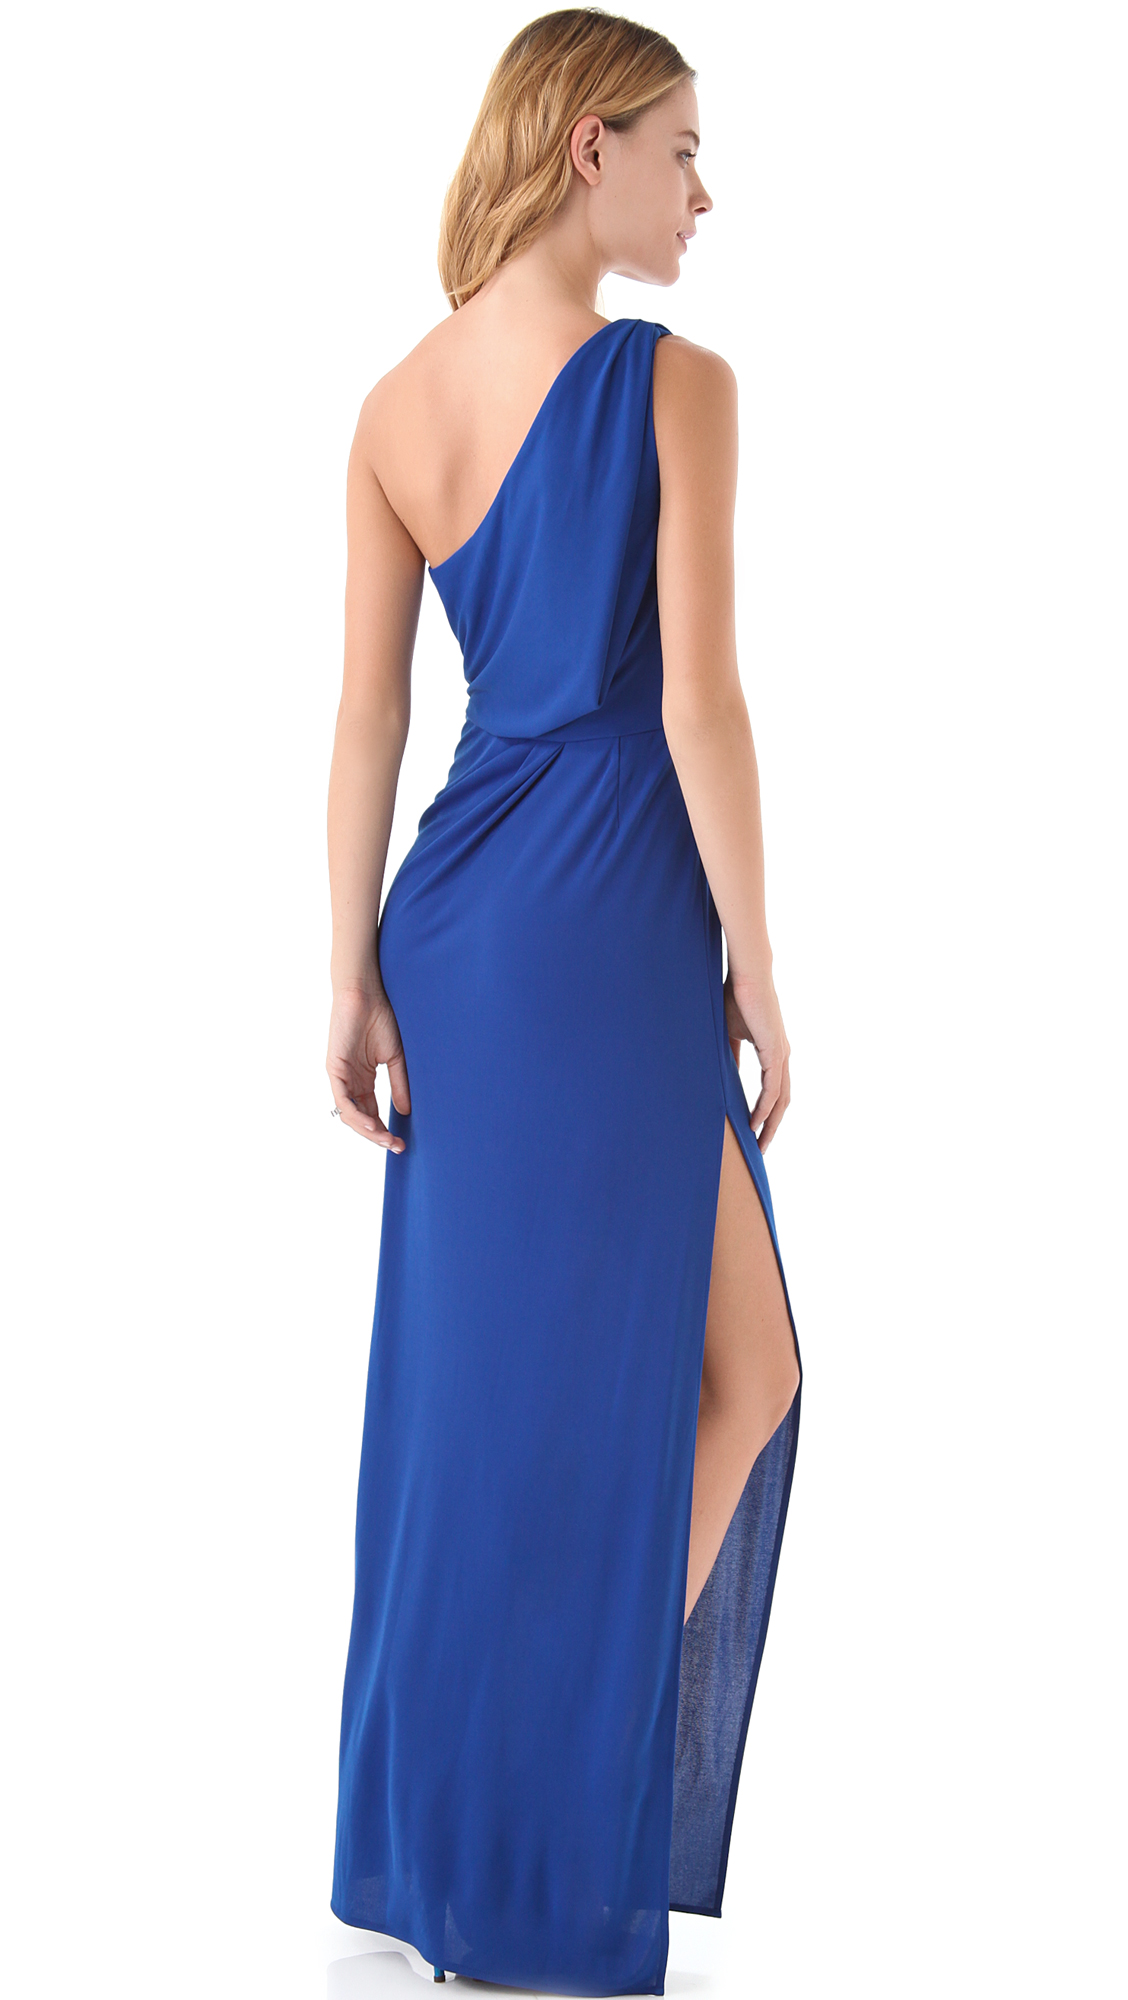 b79ddd8137 BCBGMAXAZRIA Snejana One Shoulder Gown